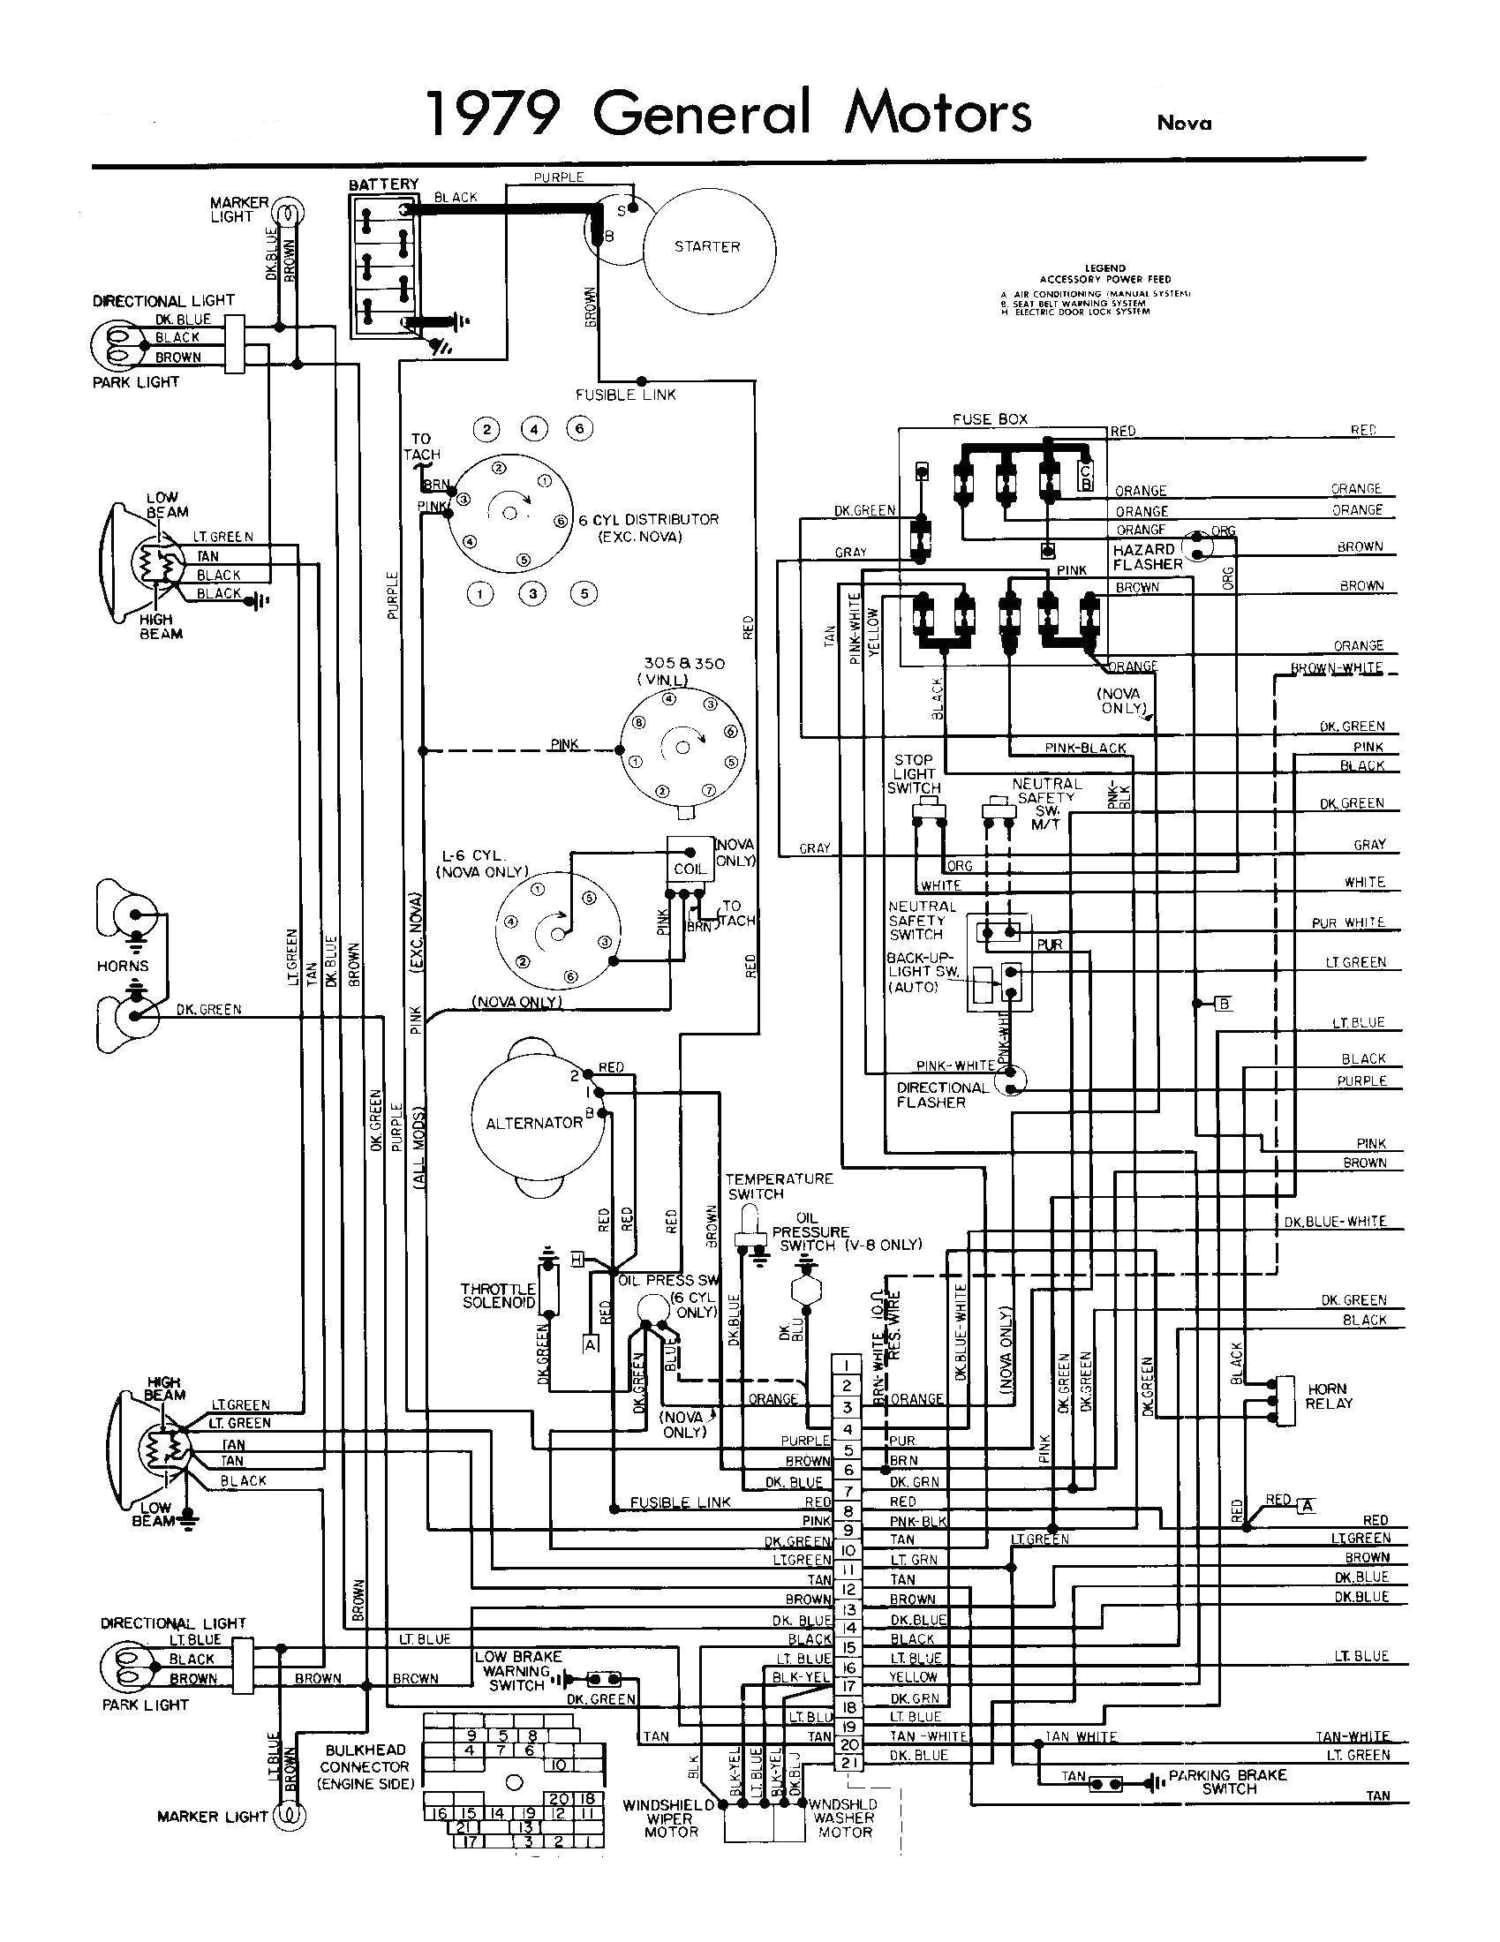 1979 gmc wiring diagram wiring diagram yes 1979 gmc sierra classic wiring diagram 1979 gmc truck wiring diagram